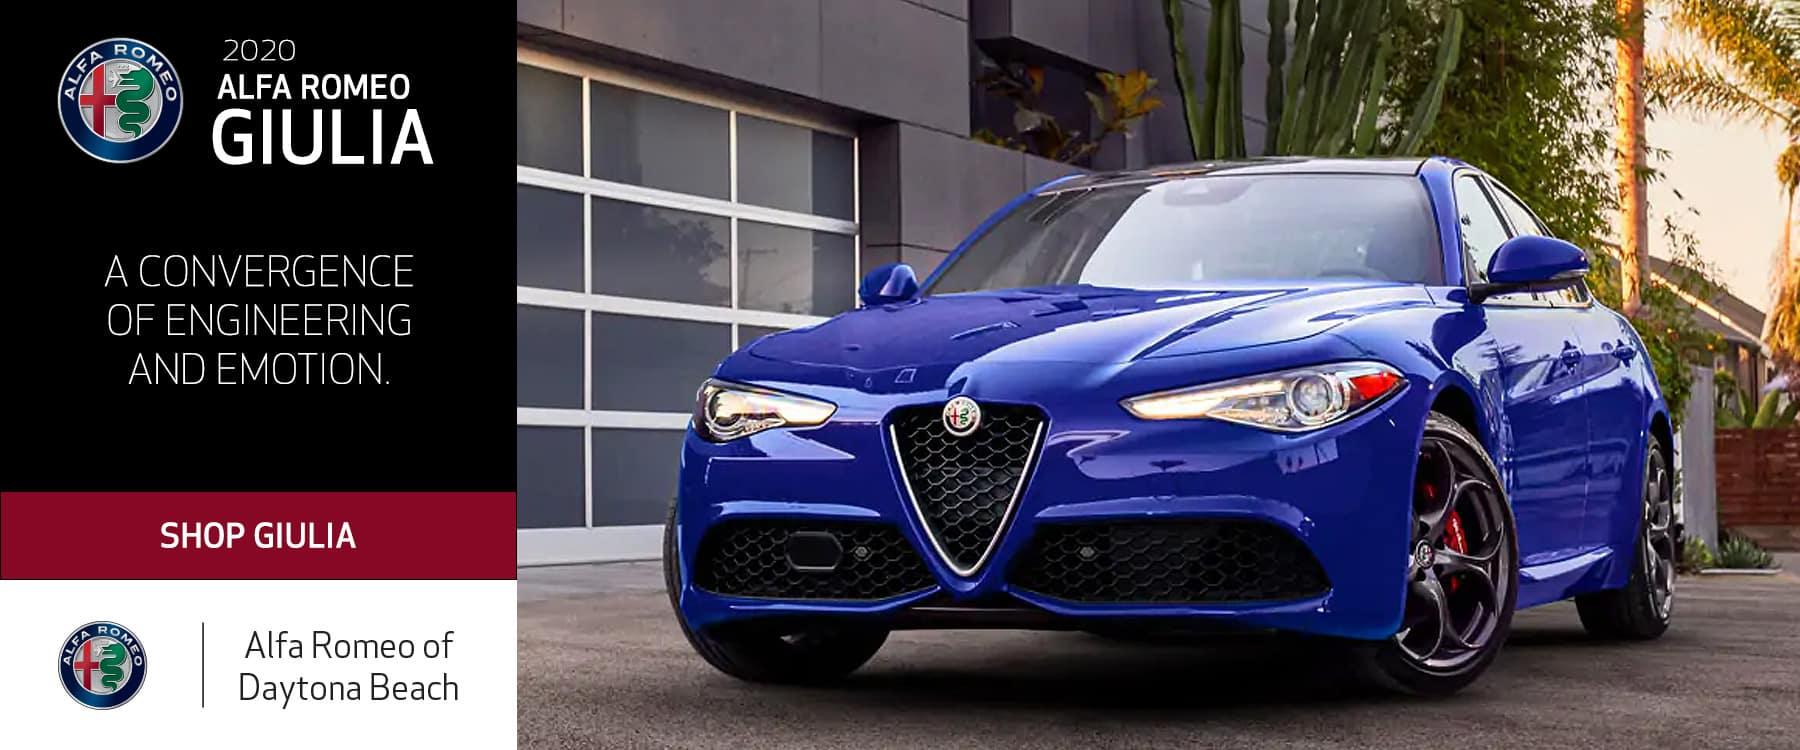 DMAR-2021-Alfa-Romeo-1800×750-MY20-Giulia-Evergreen